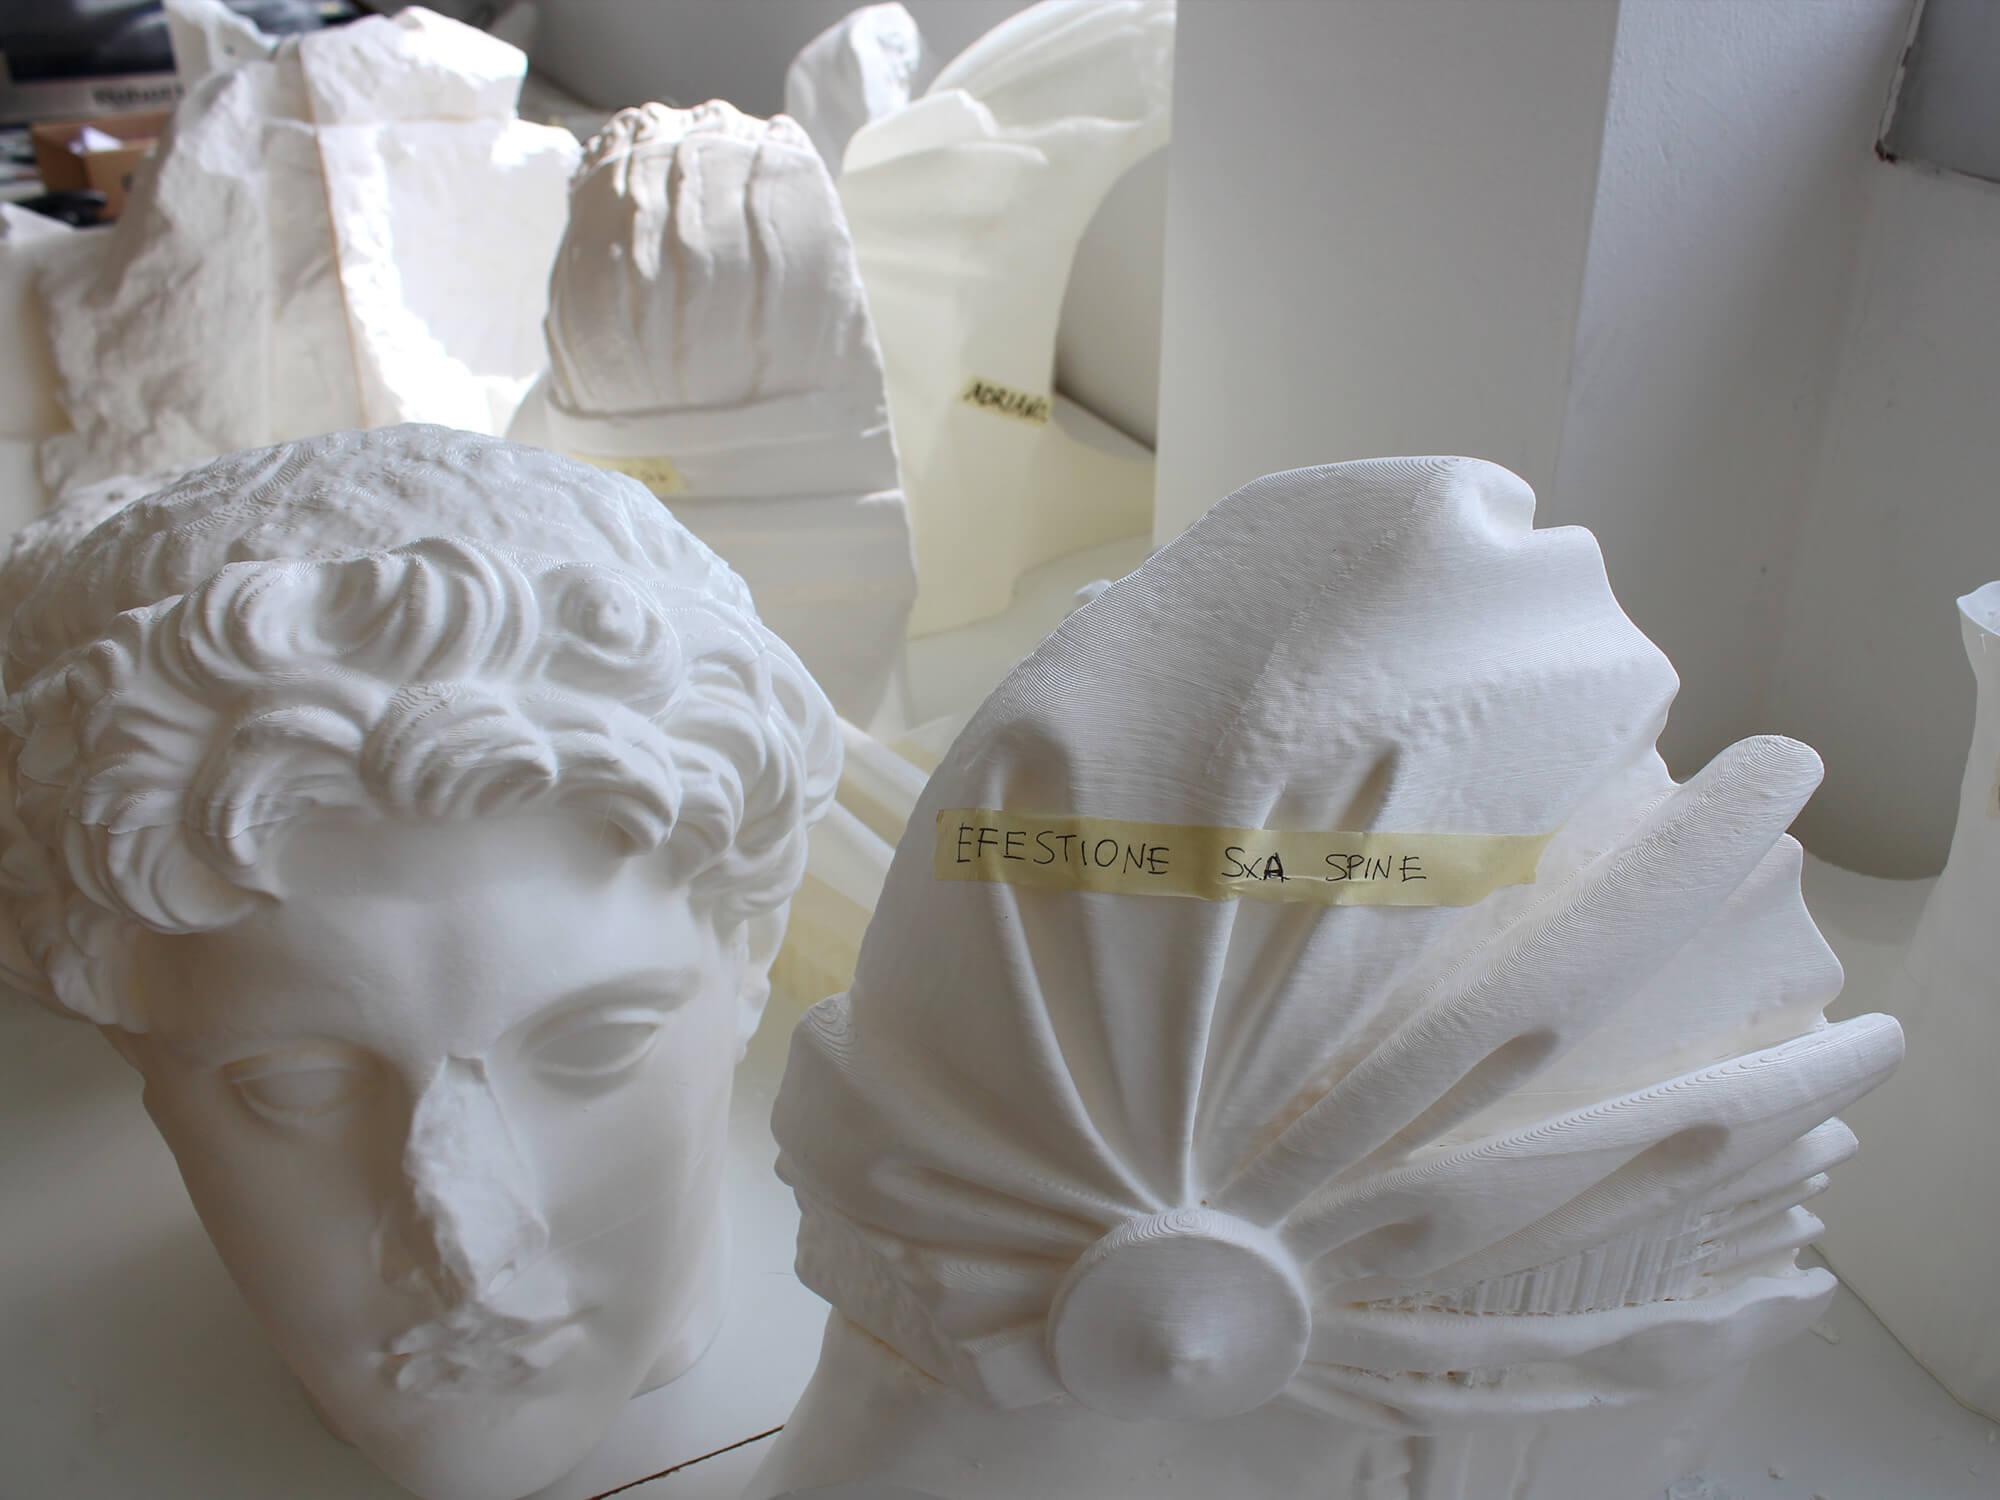 hera-busti-archeologico-fablab-venezia-1